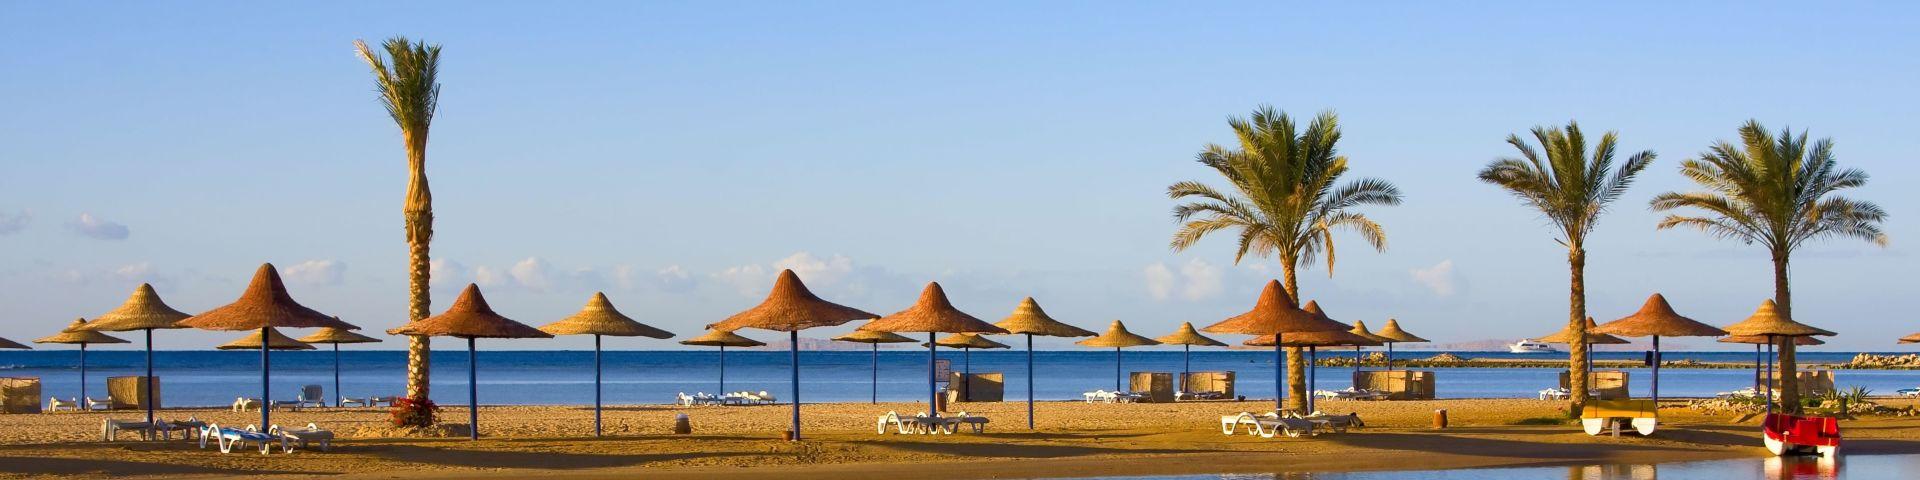 Profiter du soleil en Égypte